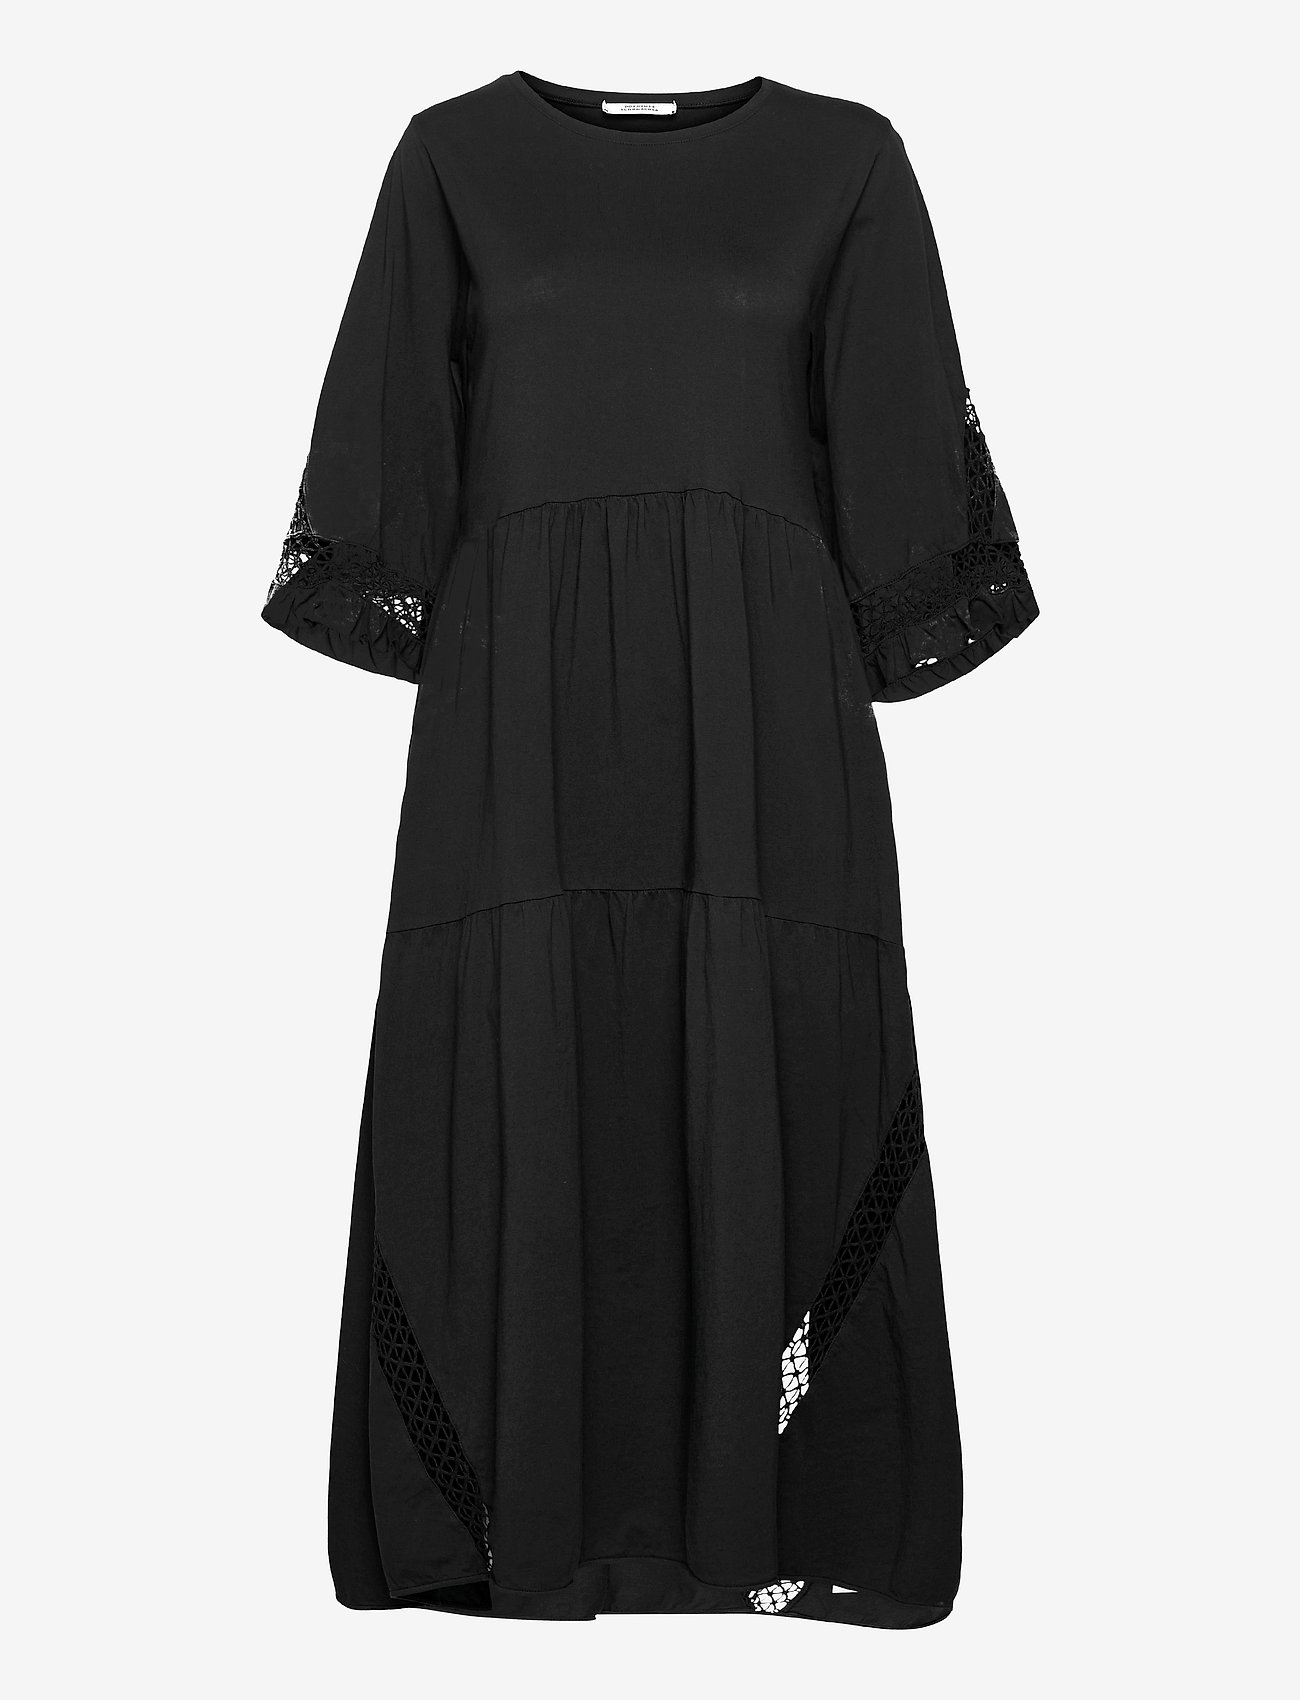 Dorothee Schumacher - CASUAL STATEMENT dress 3/4 sleeve - maxi dresses - pure black - 0